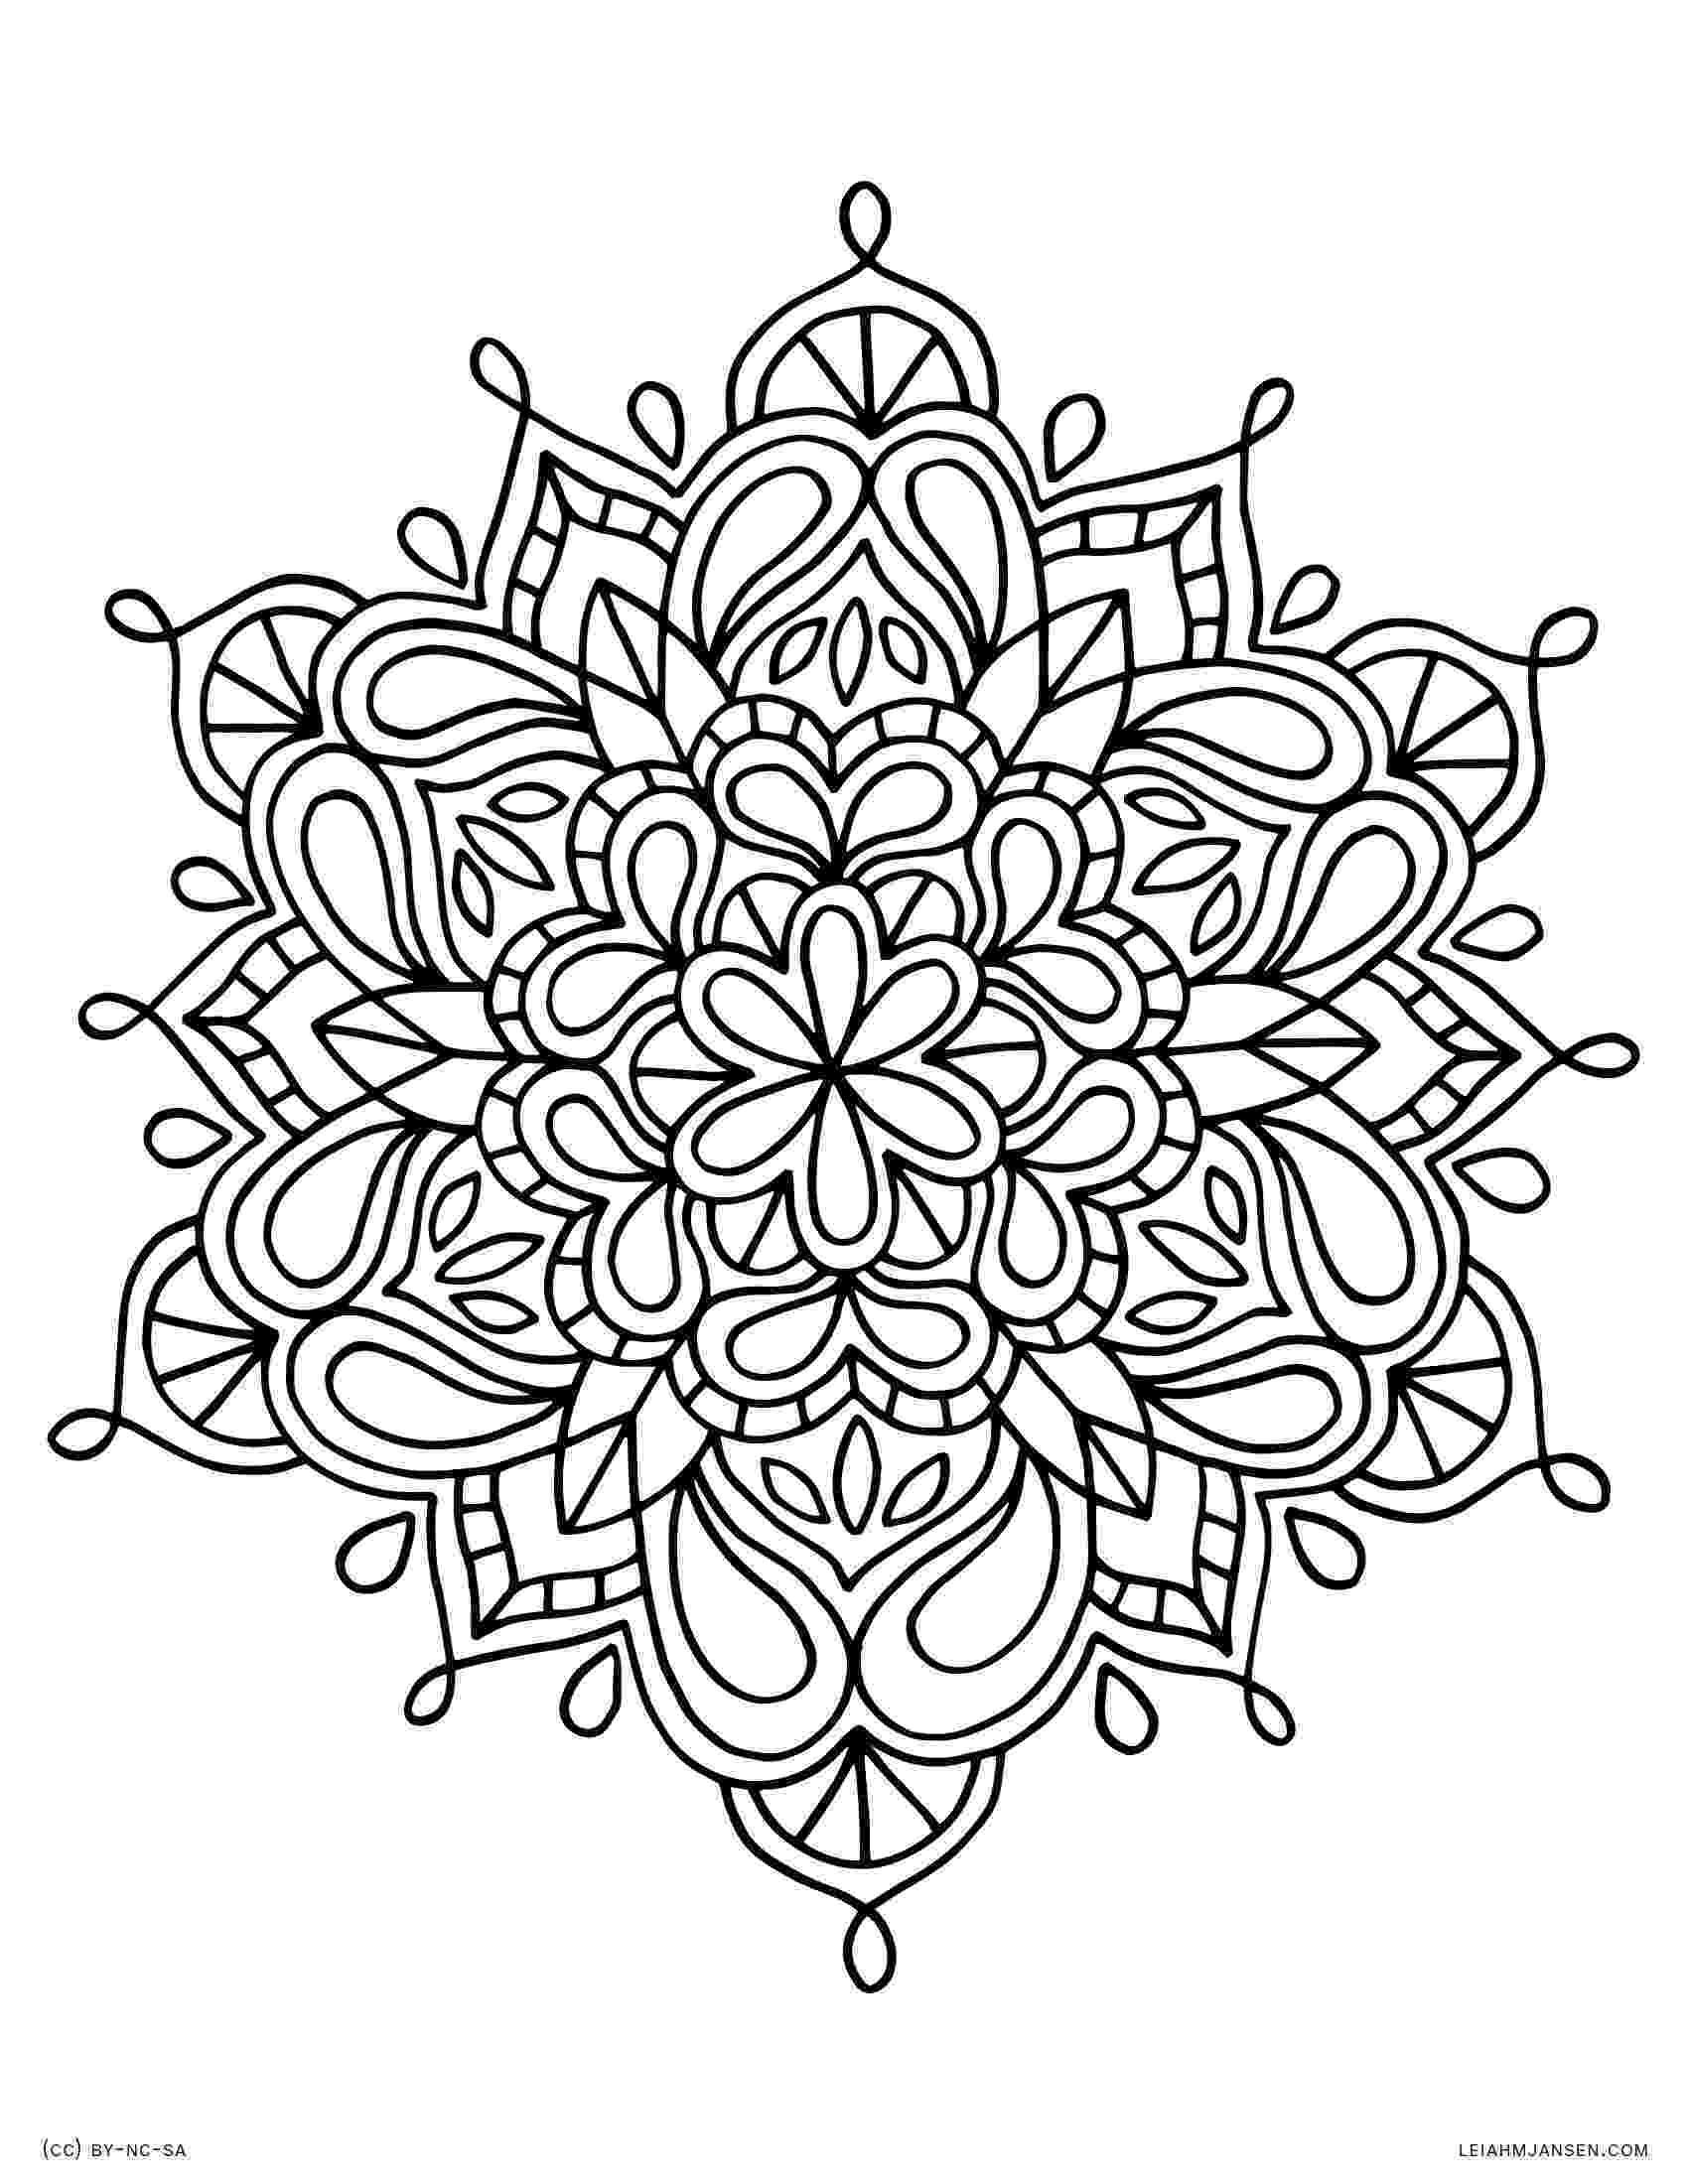 coloring pages for adults mandala mandala adult coloring pages printable coloring home mandala adults pages coloring for